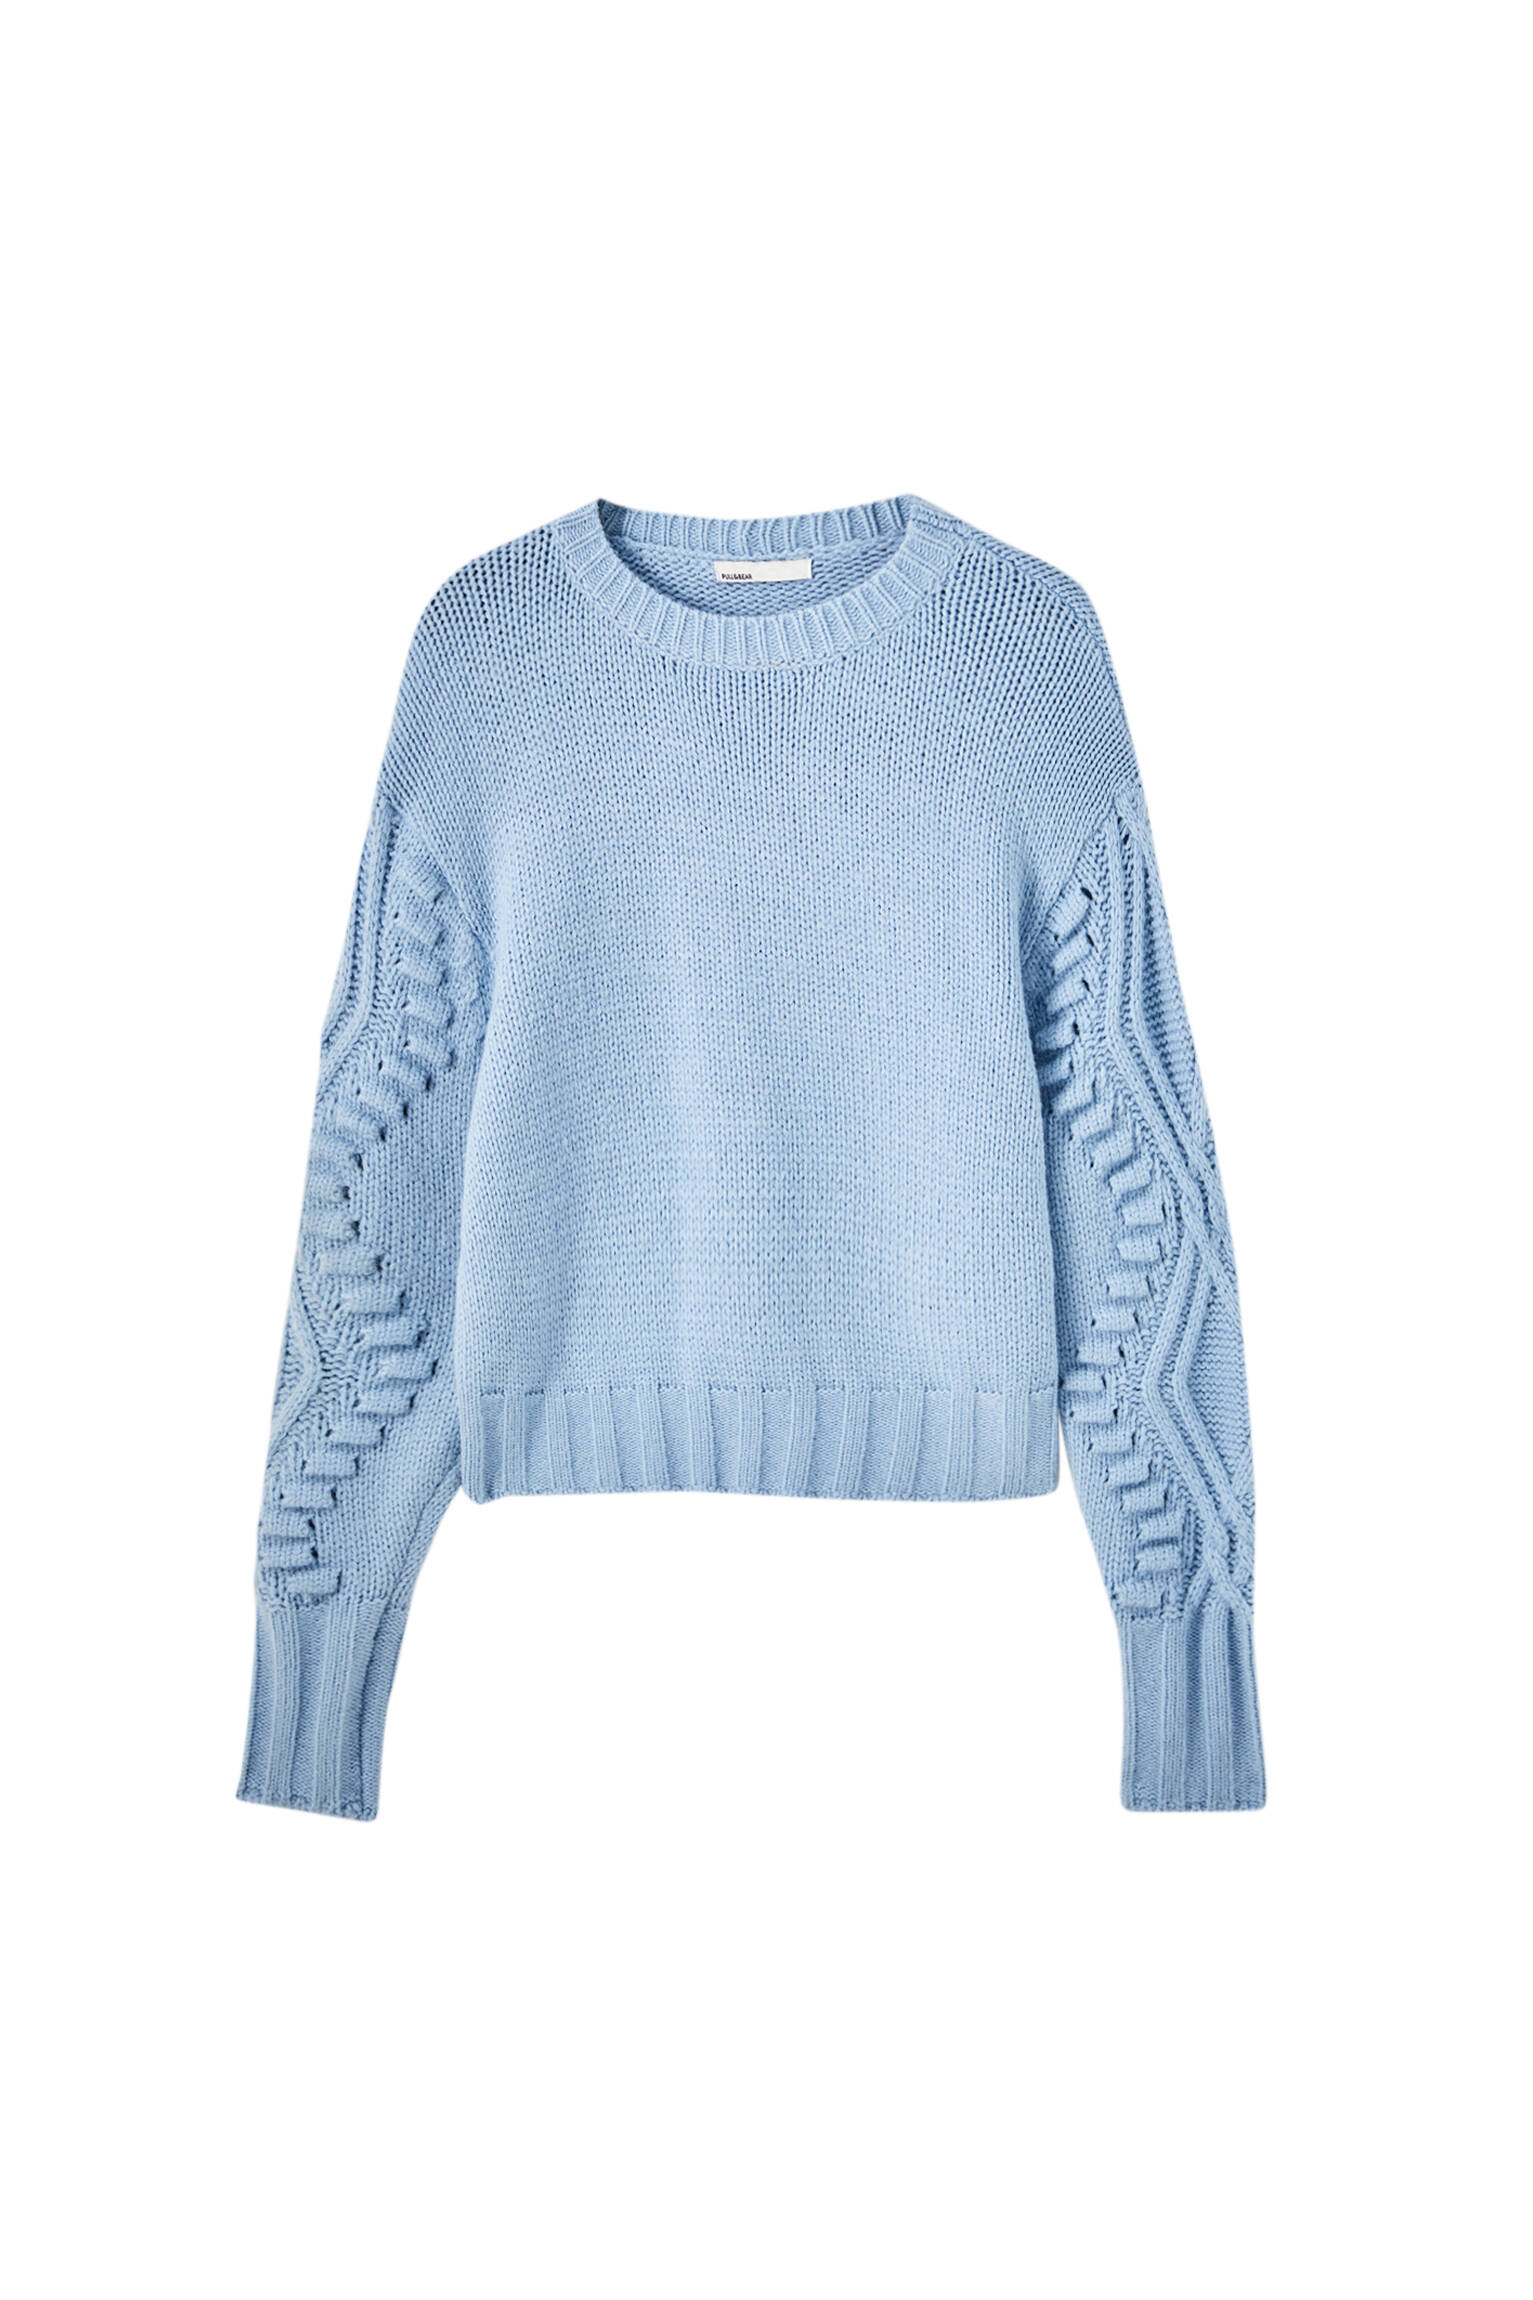 ГОЛУБОЙ Синий свитер крупной вязки с узором «косы» Pull & Bear